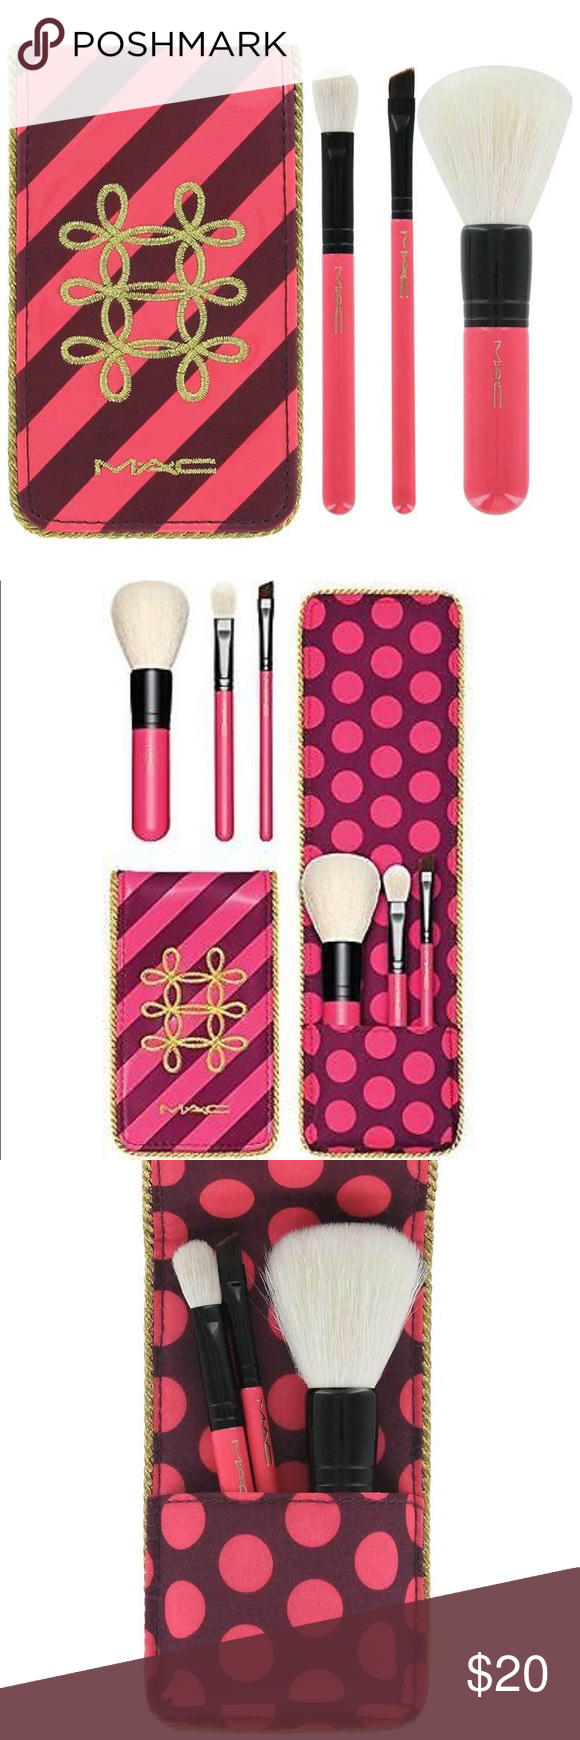 Limited Edition Mac Essential Brush Set Travel NWT